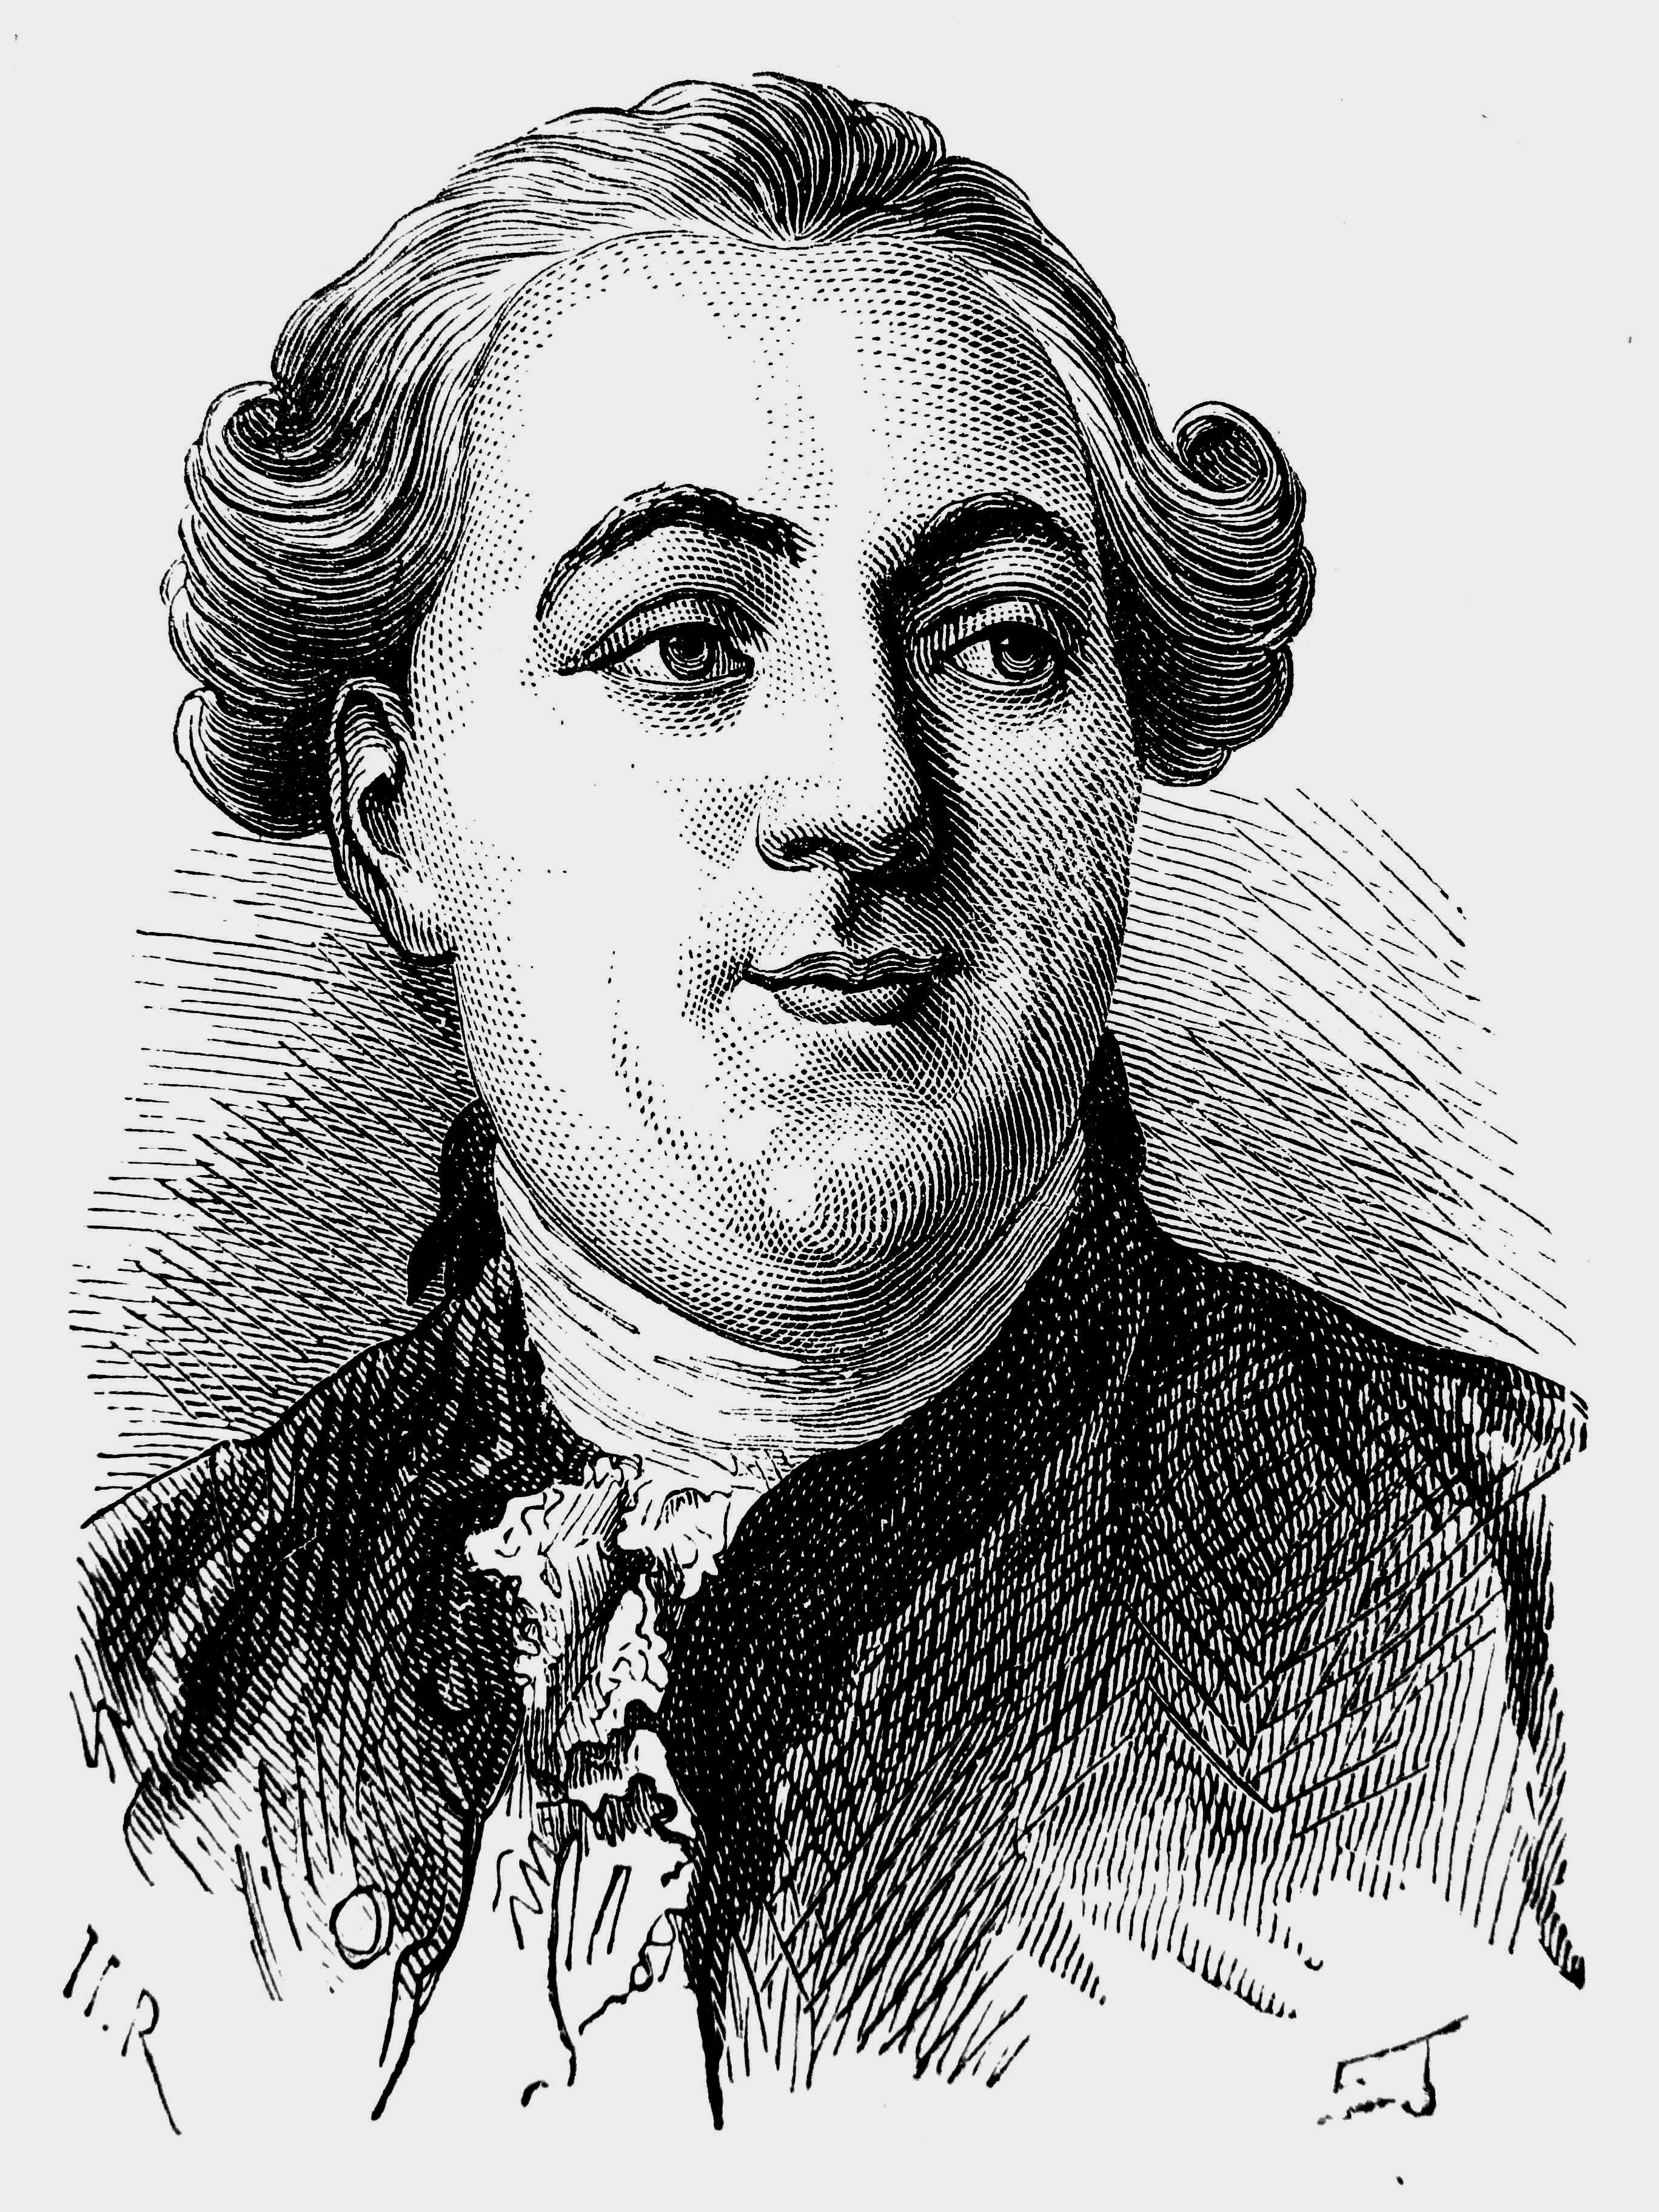 File:AduC 025 Necker (J., 1732-1804).JPG - Wikimedia Commons